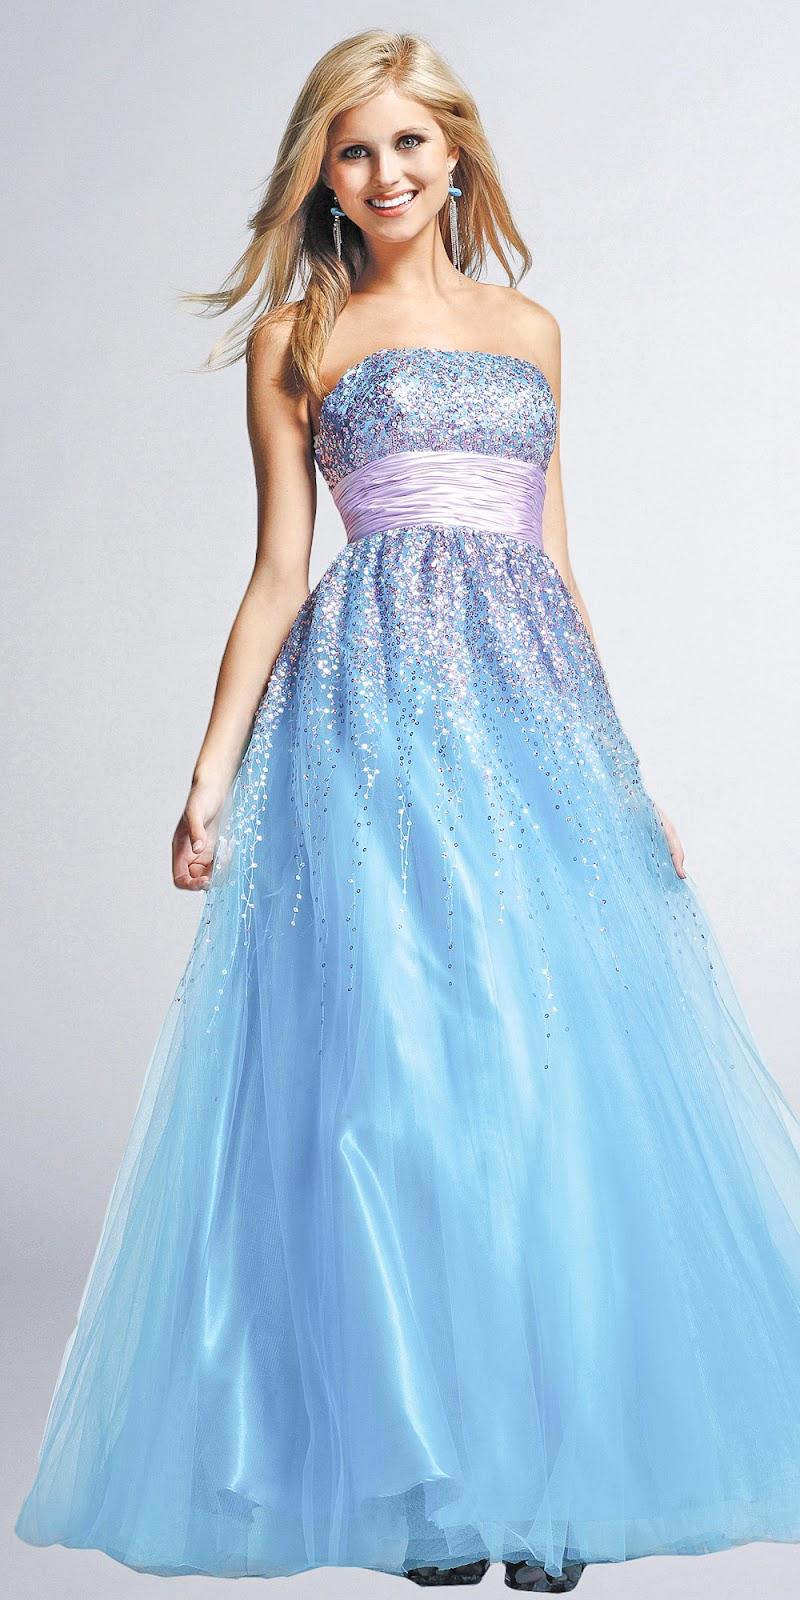 New Fashion Mall: Pretty Prom Dresses